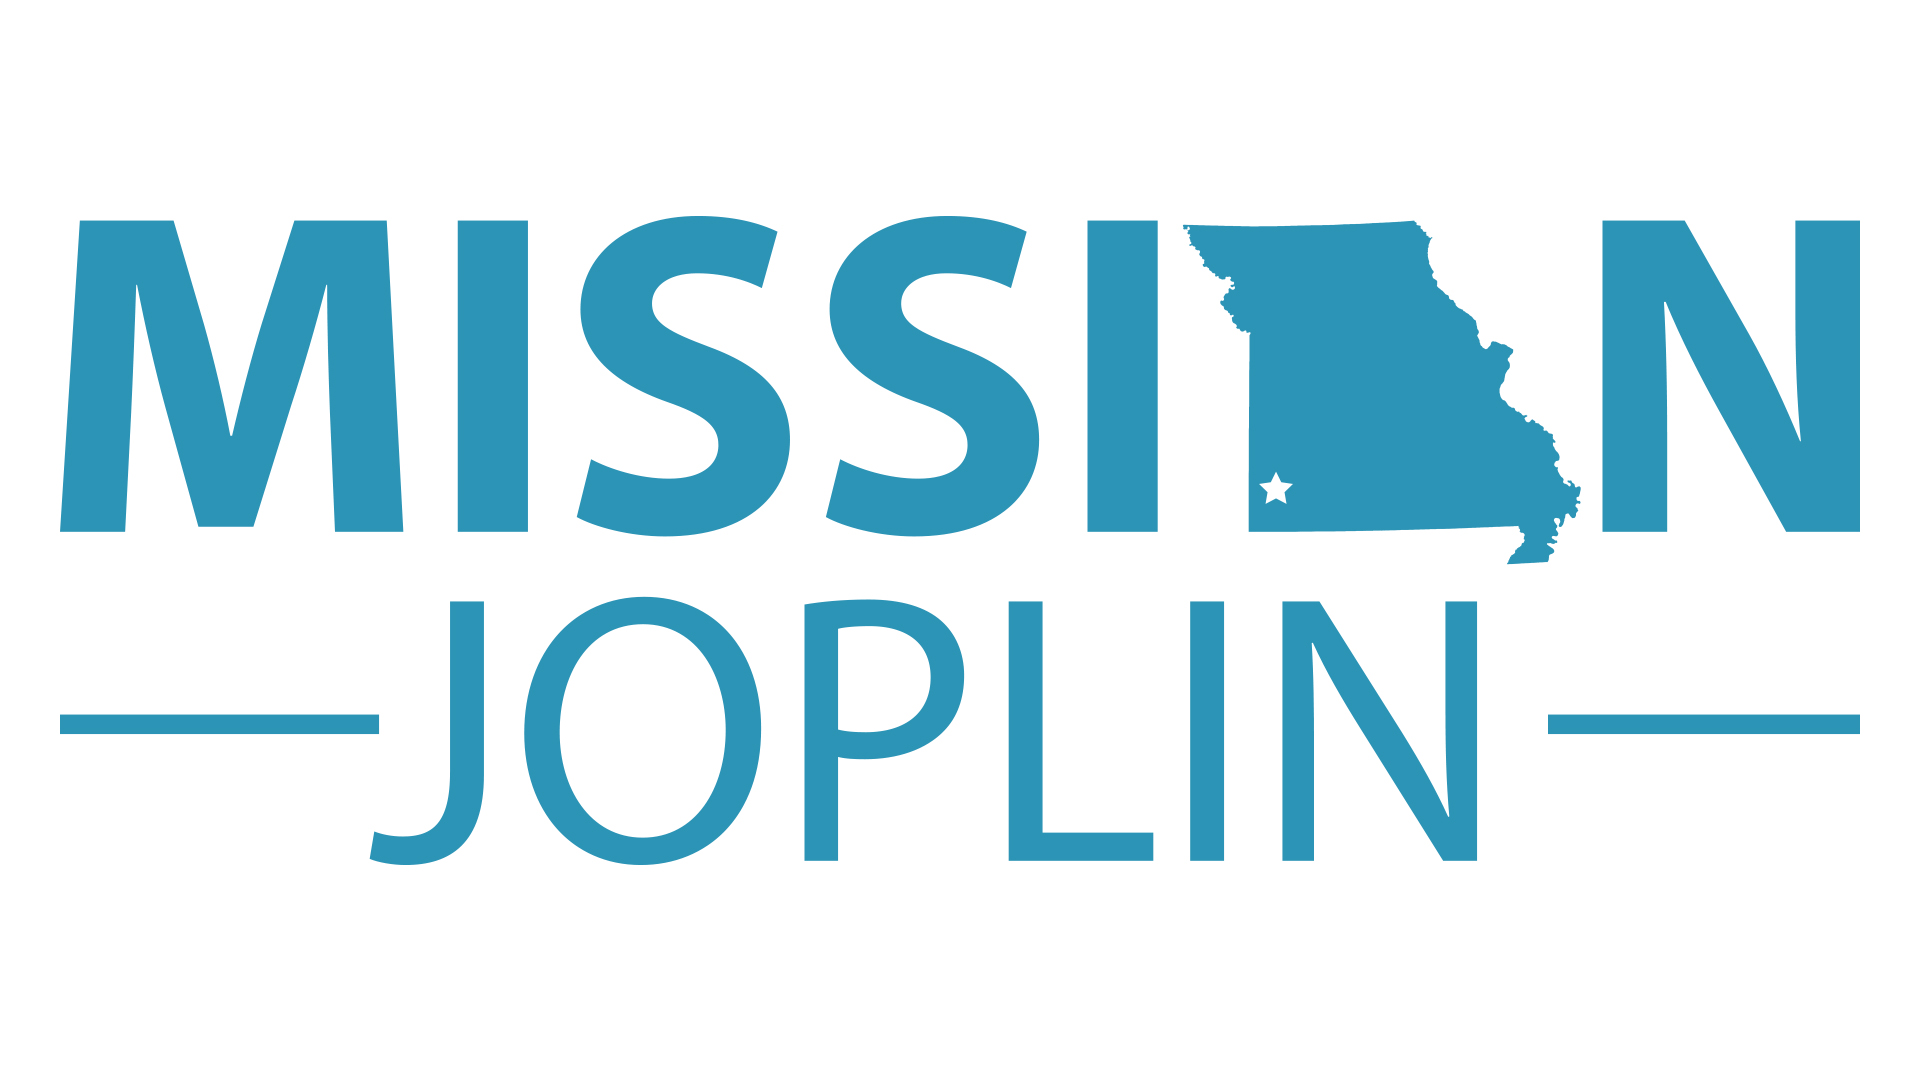 Mission Joplin - Hope for Joplin. Glory to God!